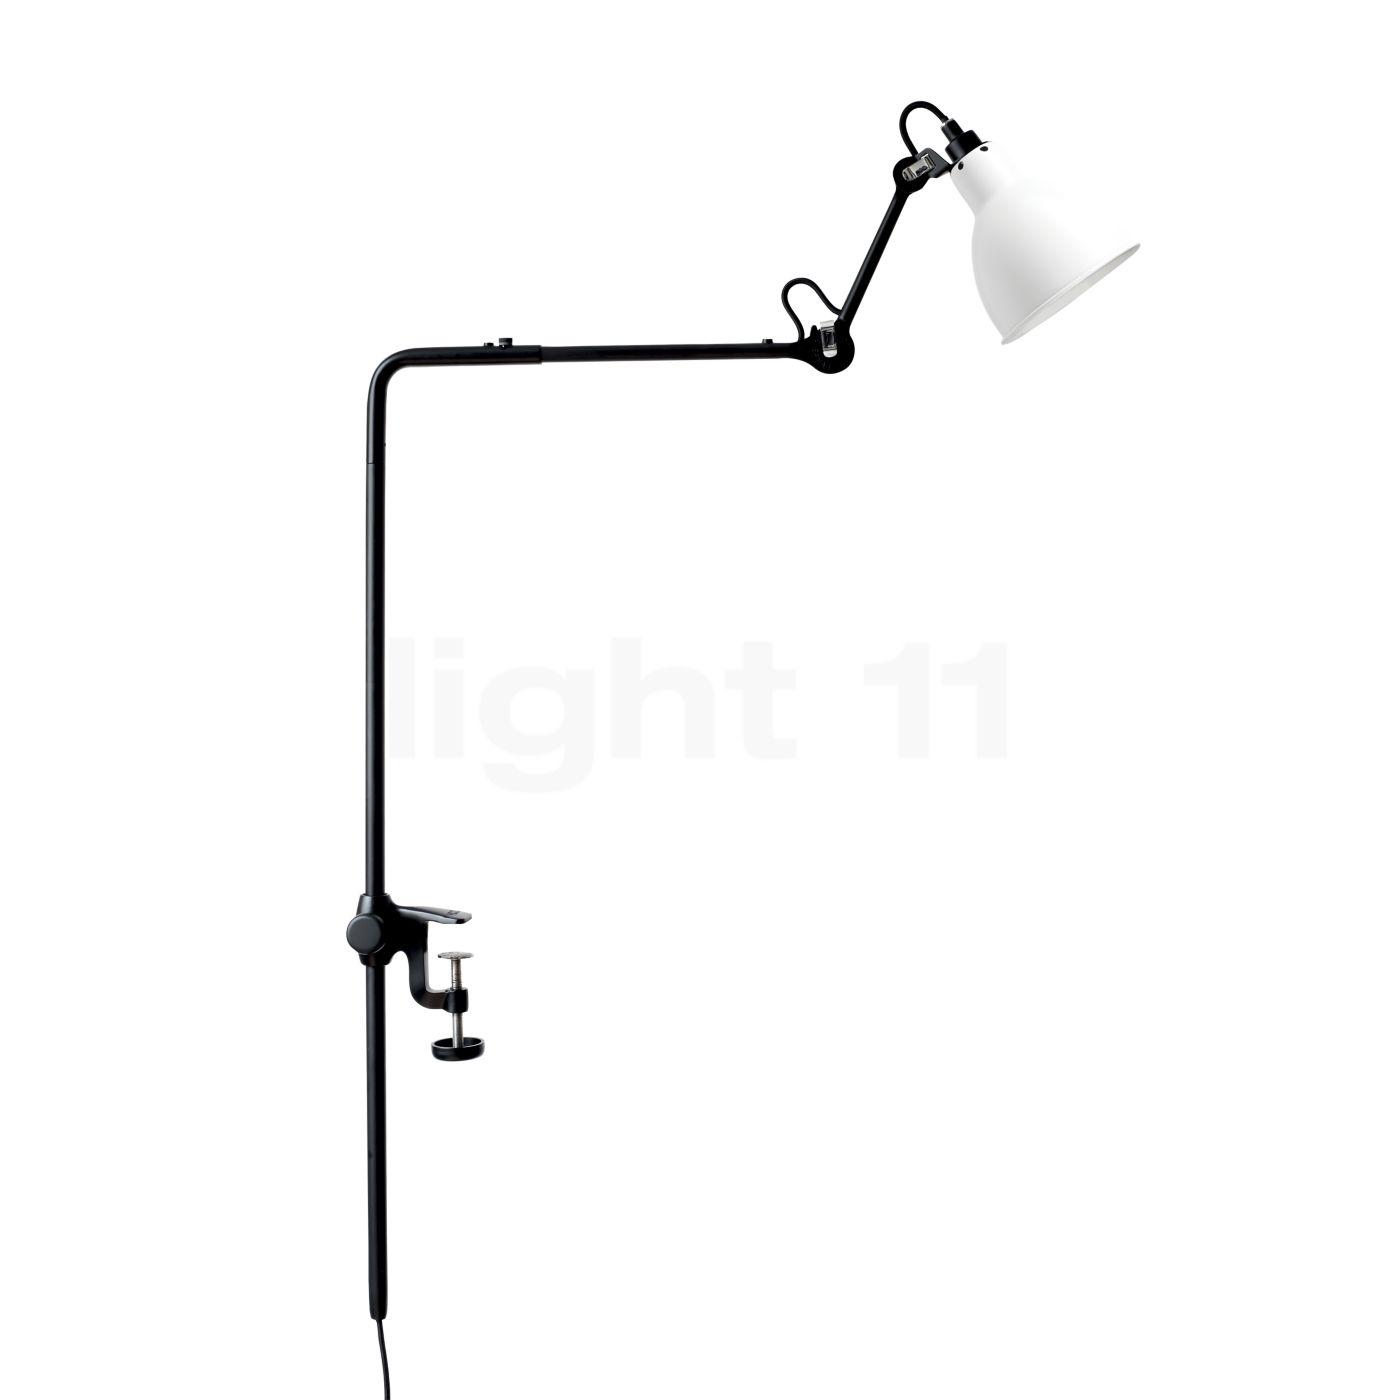 DCW Lampe Gras No 226 Klemmleuchte, weiß 226 BL-WH